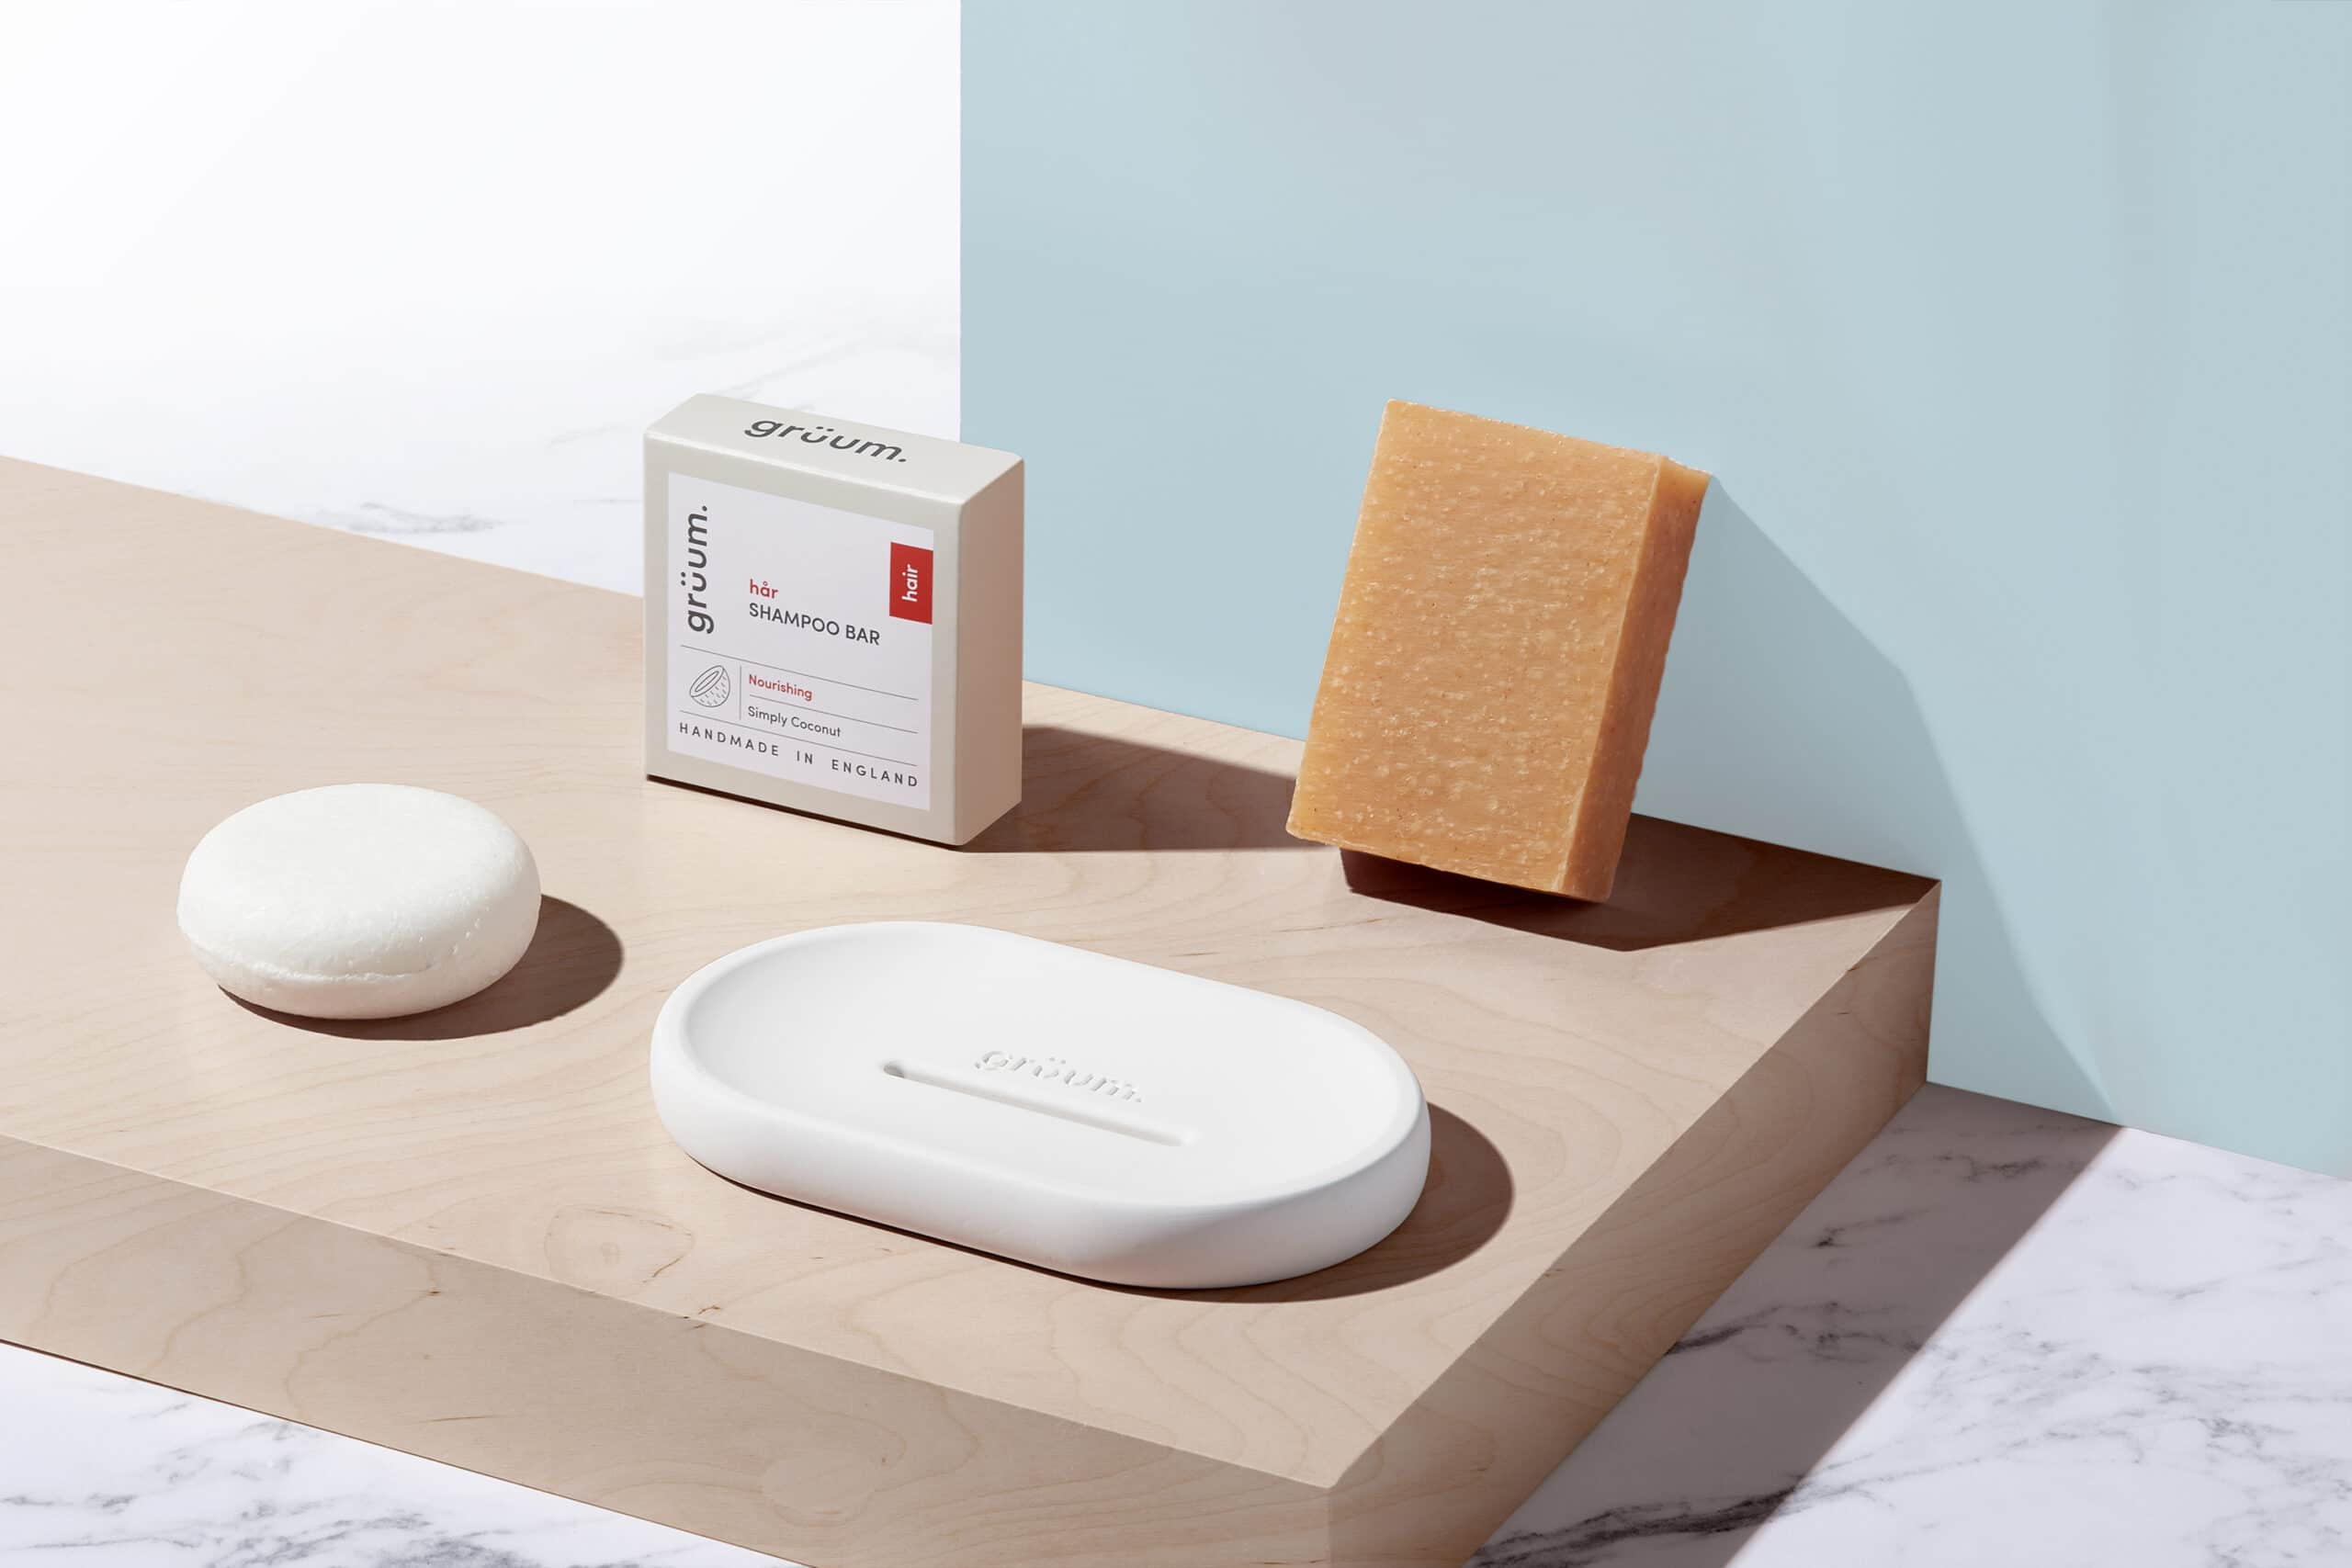 Gruum shampoo & body gift set product image with shampoo bar, body bar and halla soap dish